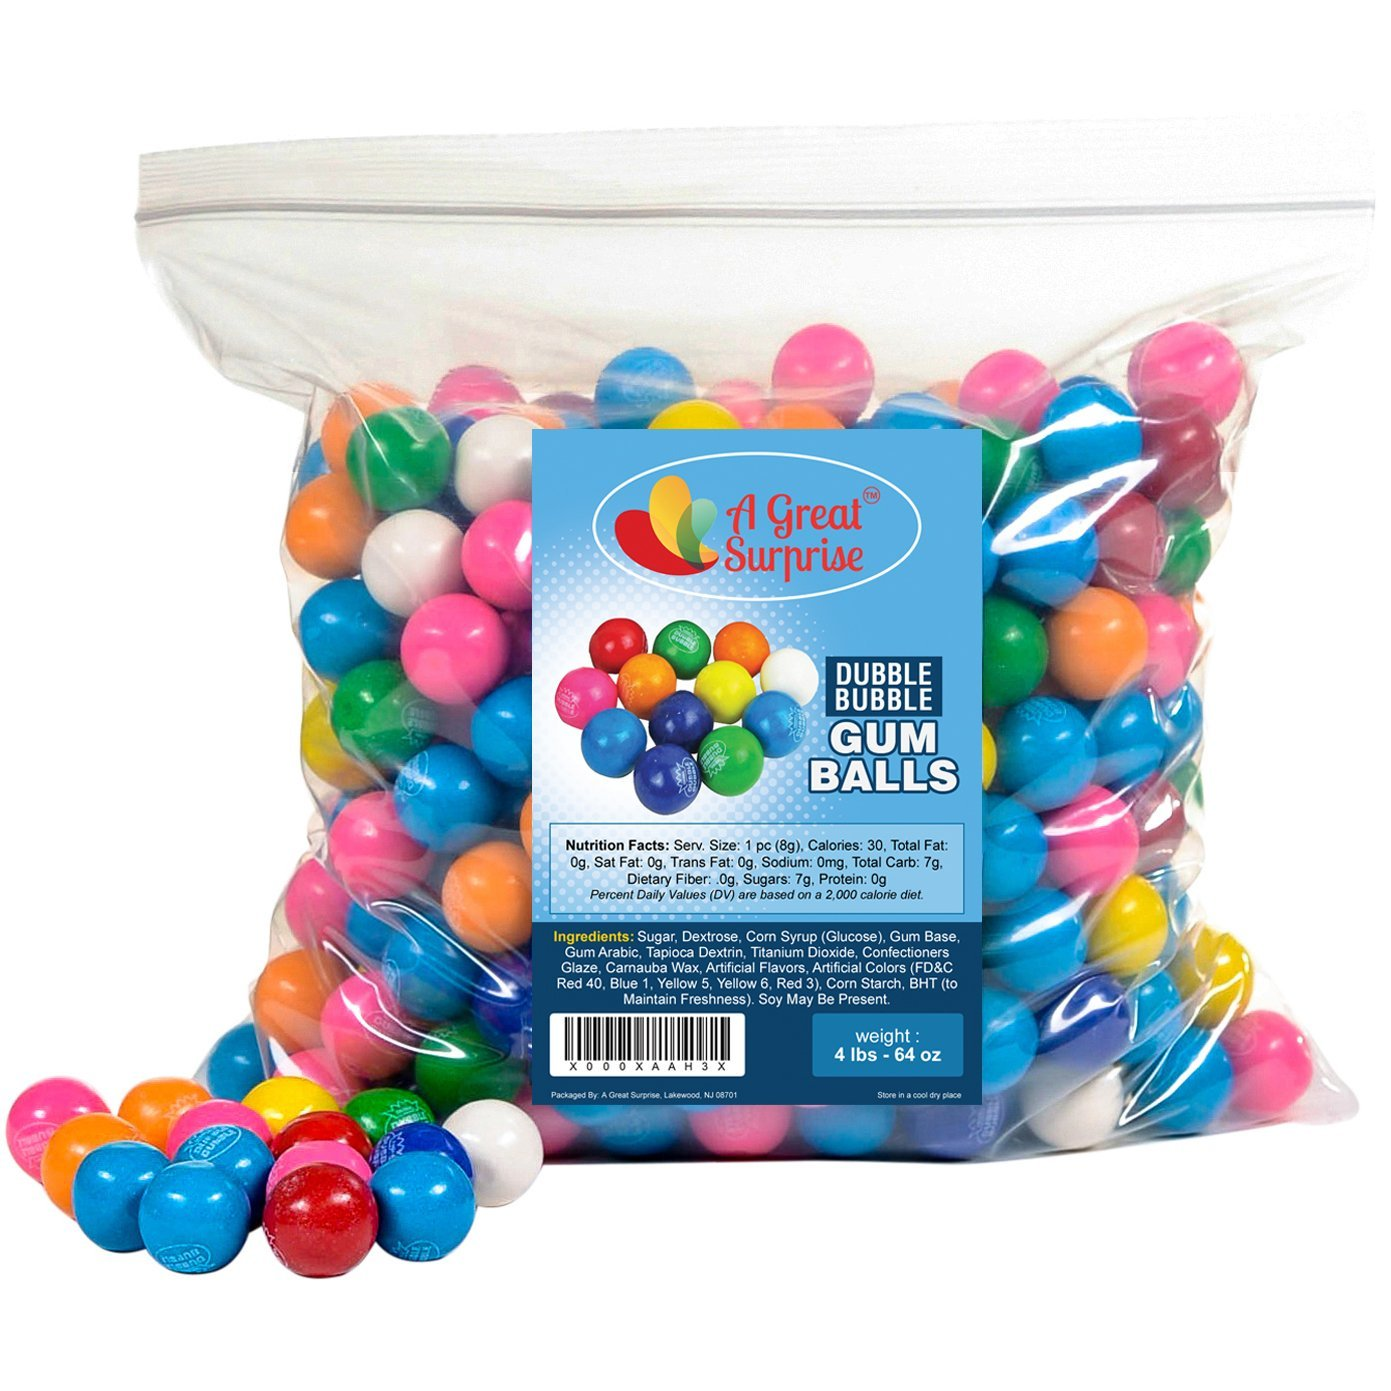 Dubble Bubble Gumballs - Gumballs in Bulk - Gumballs Refill - Gumballs for Gumball Machines - Gumballs 1 Inch, Assorted Flavors, Bulk Candy 4 LBS